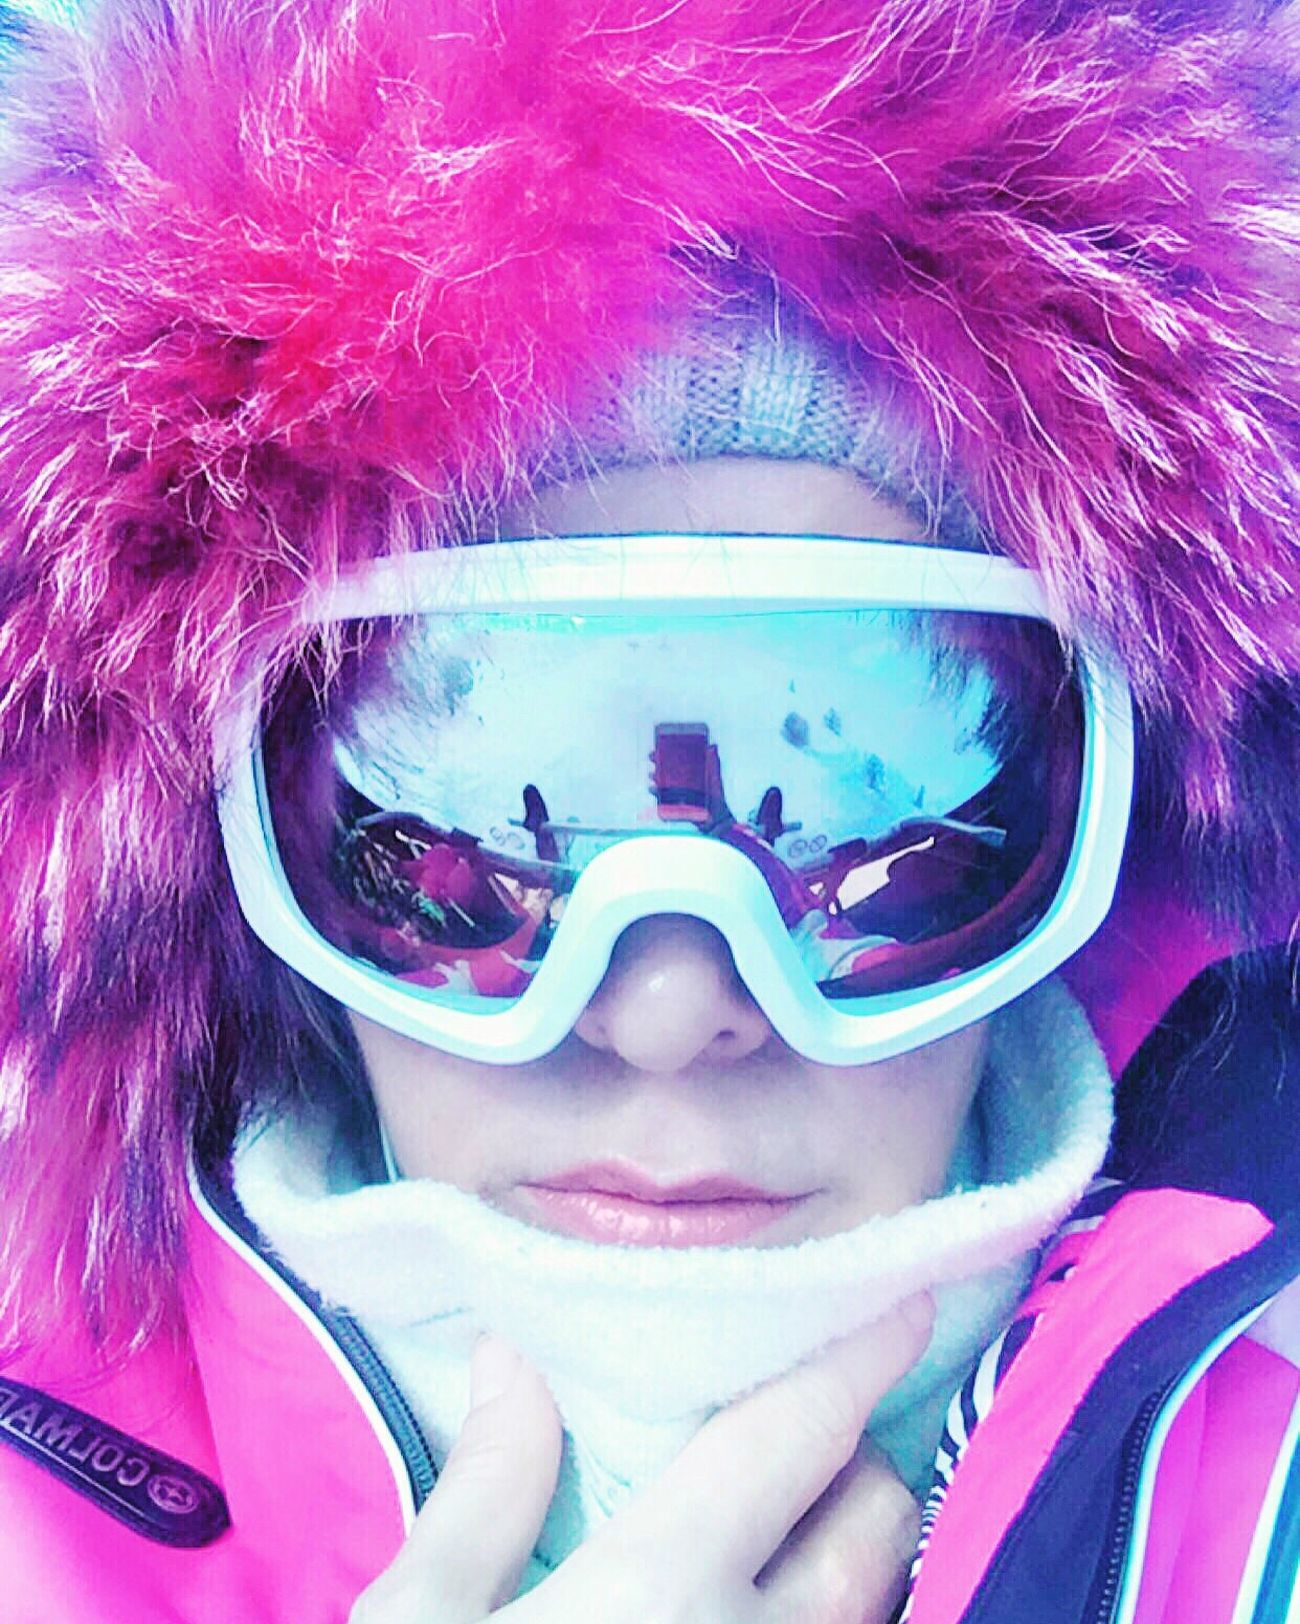 Skiing Snow Uludag Women IPhoneography EyeEm Best Shots - Nature OpenEdit EyeEm Gallery Iphoneonly IPhone Photography Iphone6s Photography Iphonesia Iphone6splus